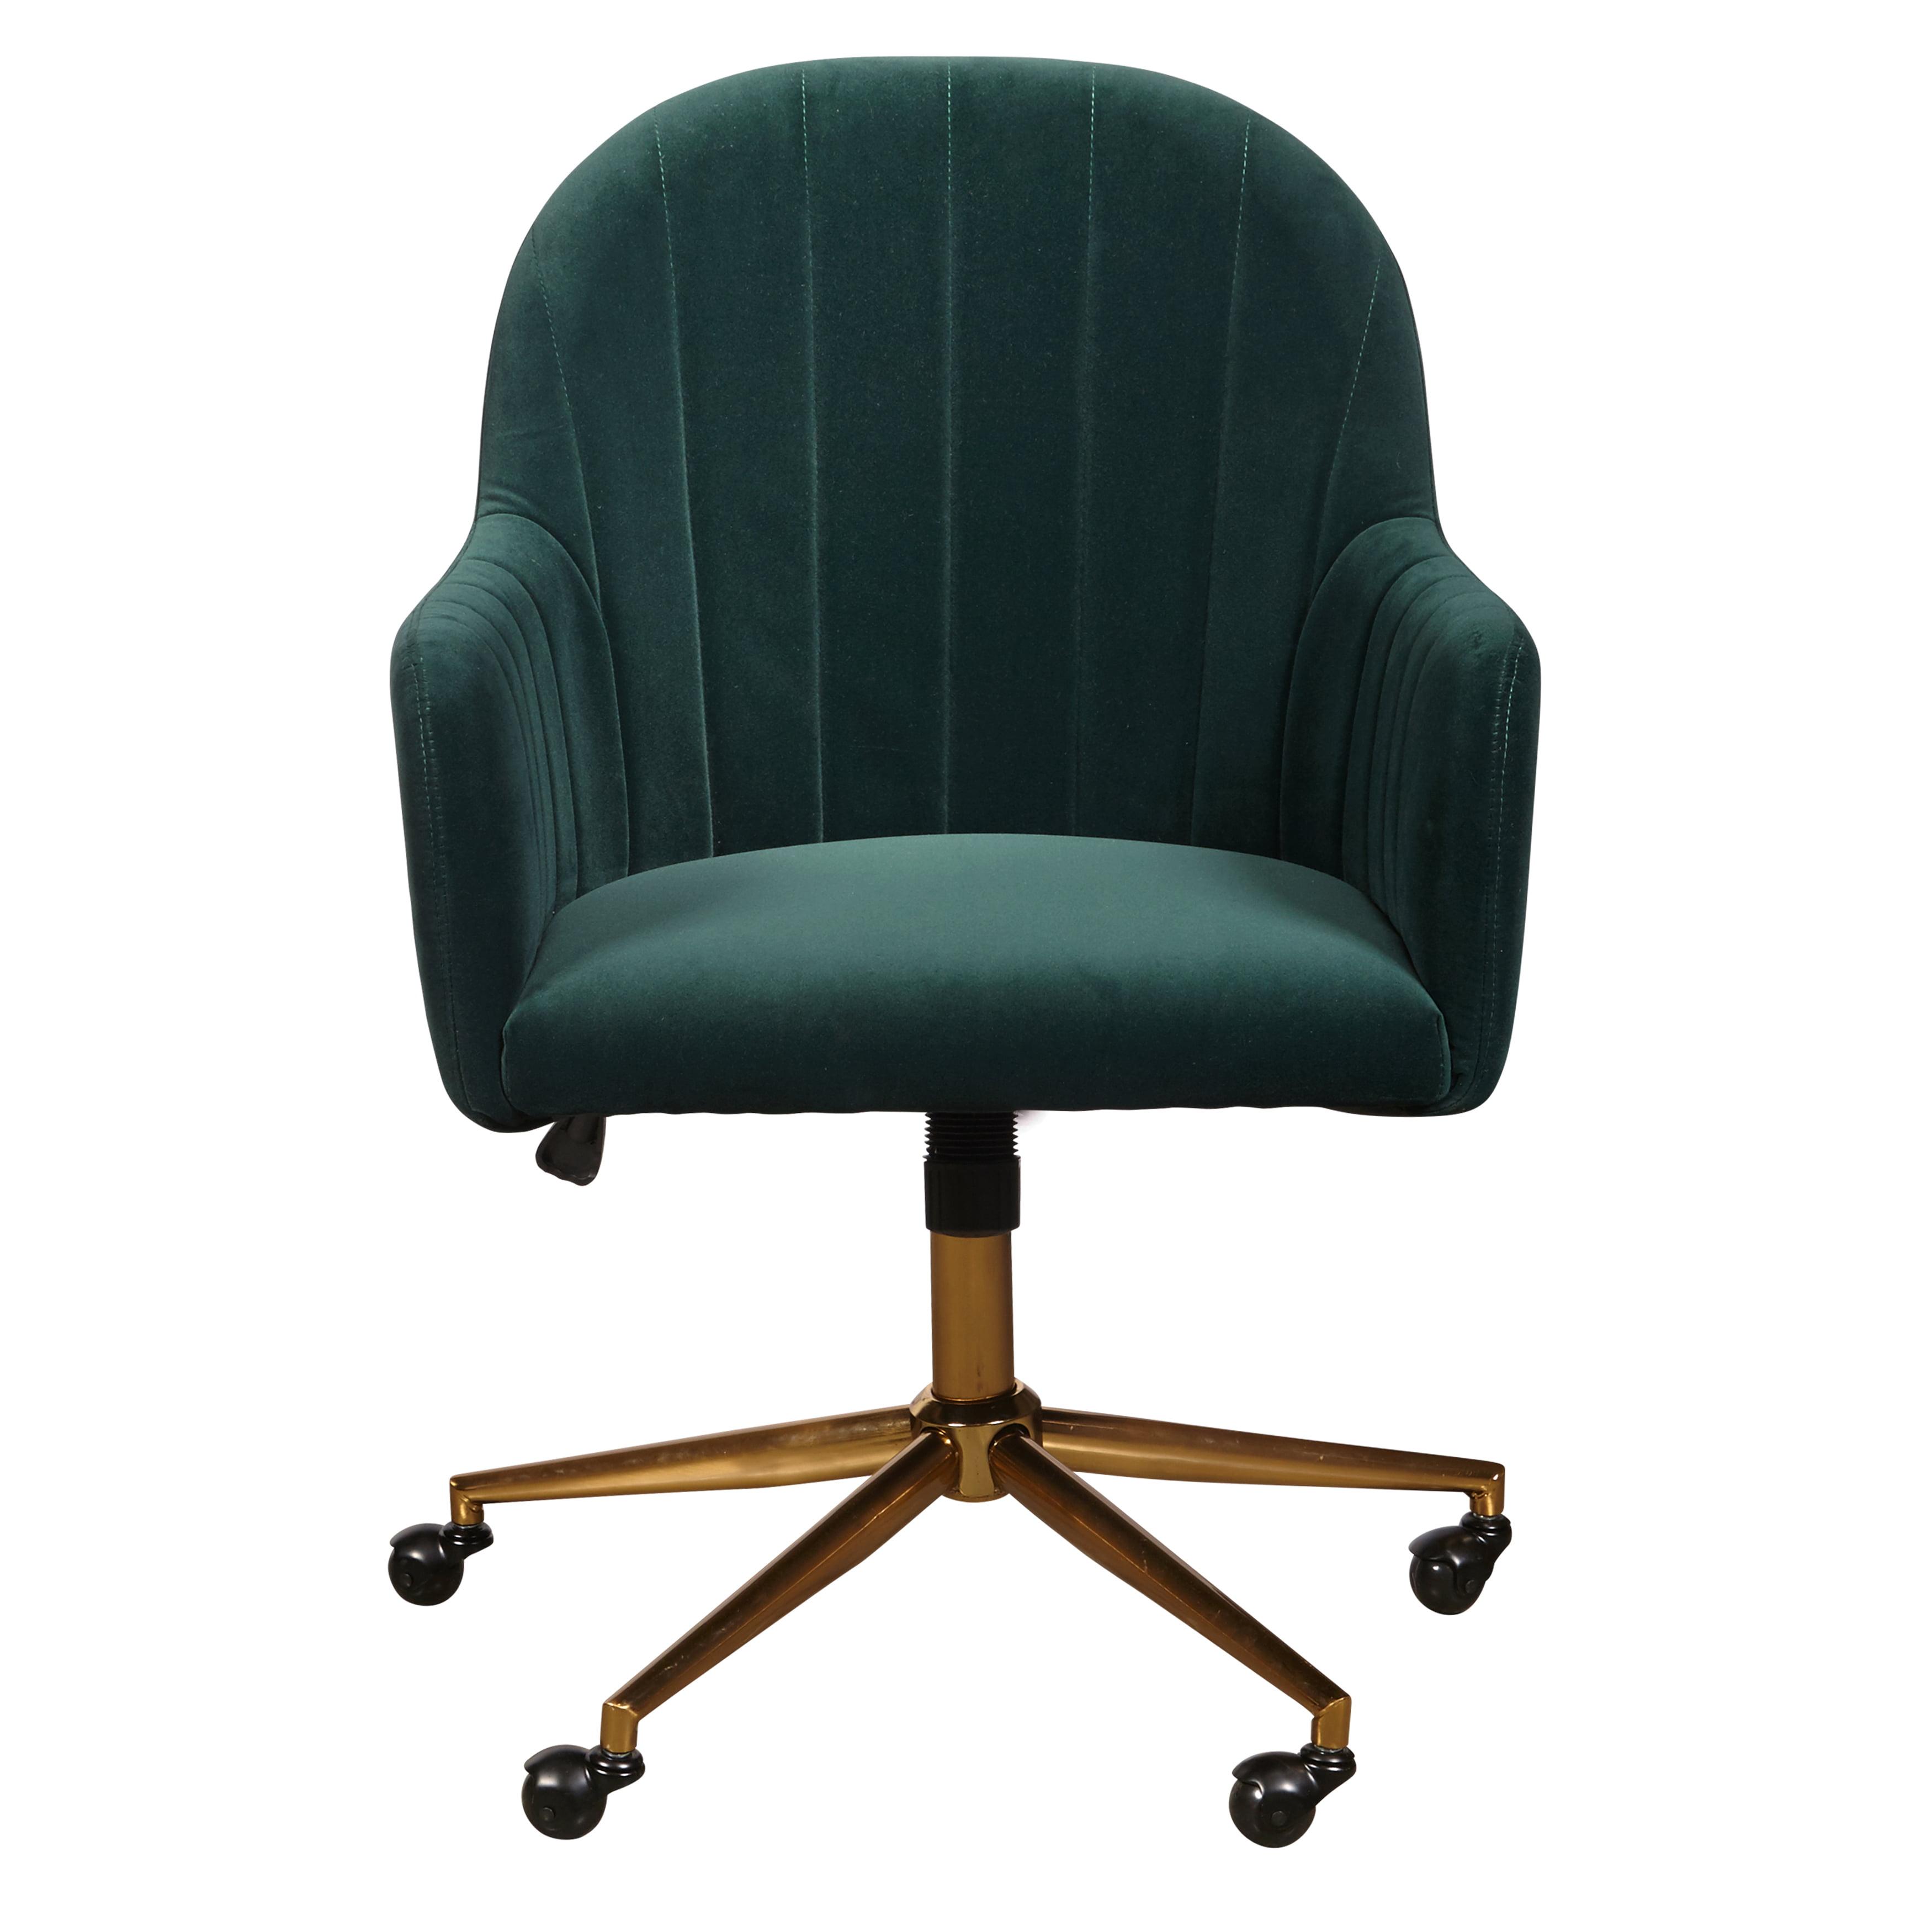 Upholstered Channel Tufted Office Chair In Emerald Green Velvet Walmart Com Walmart Com